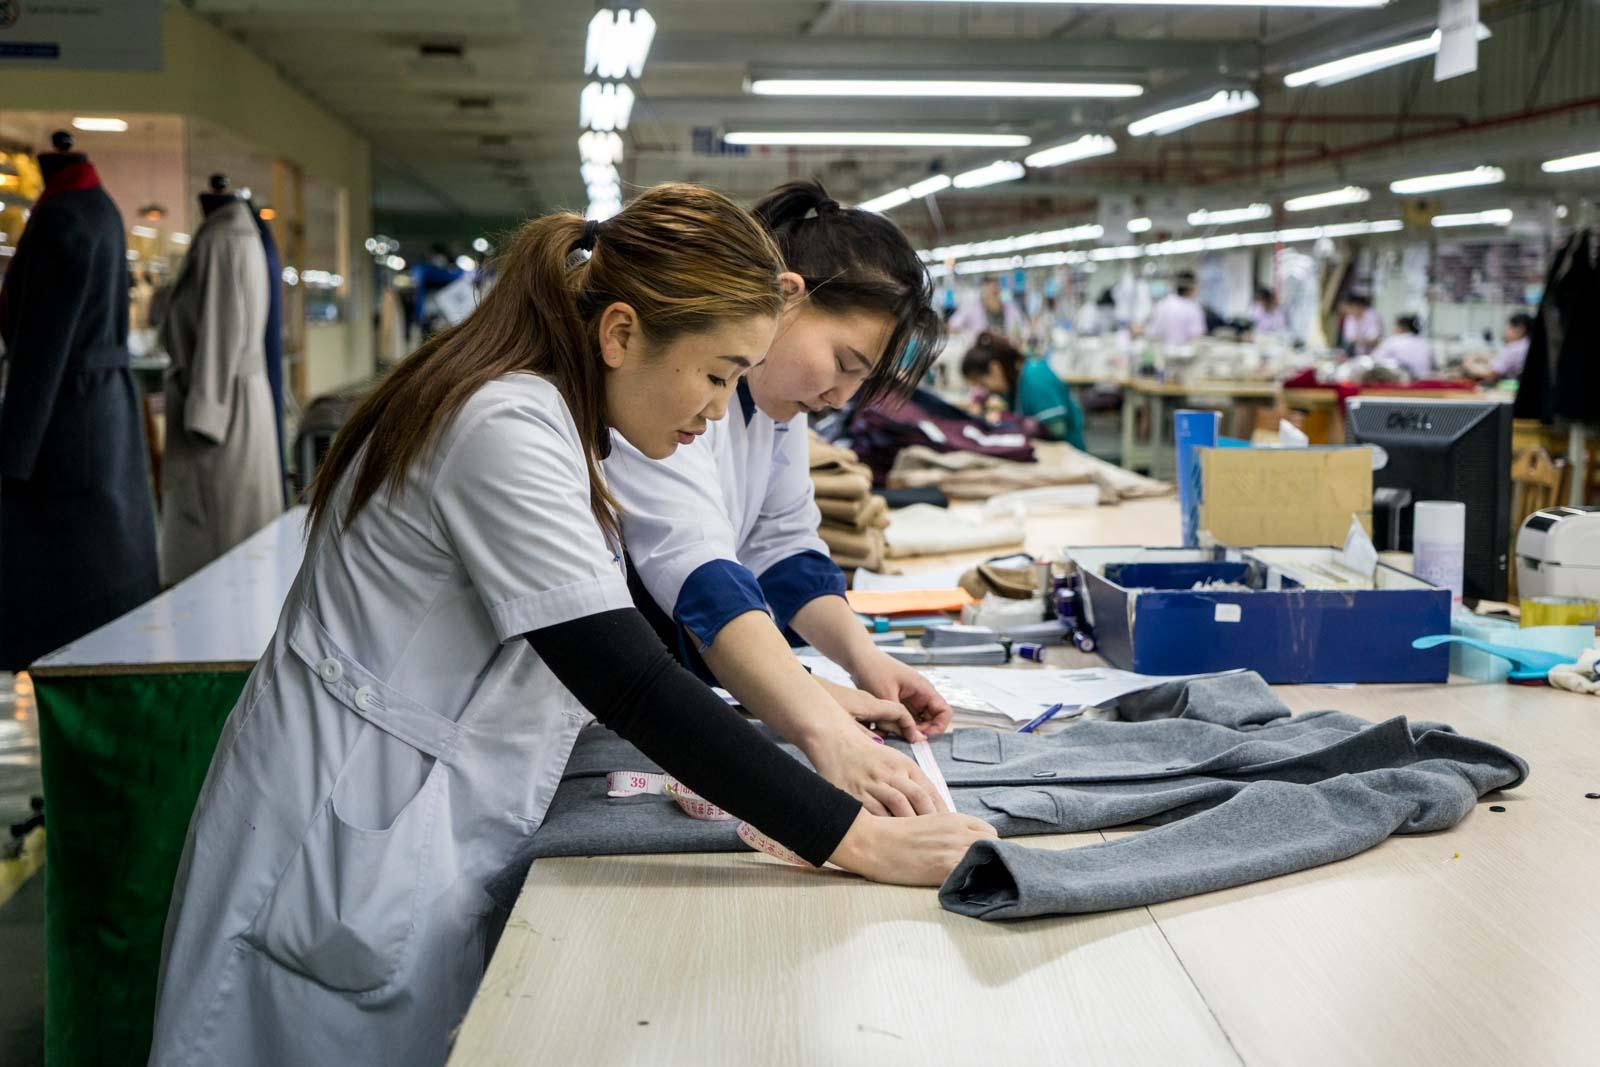 Gobi cashmere factory, Ulaanbaatar, Mongolia